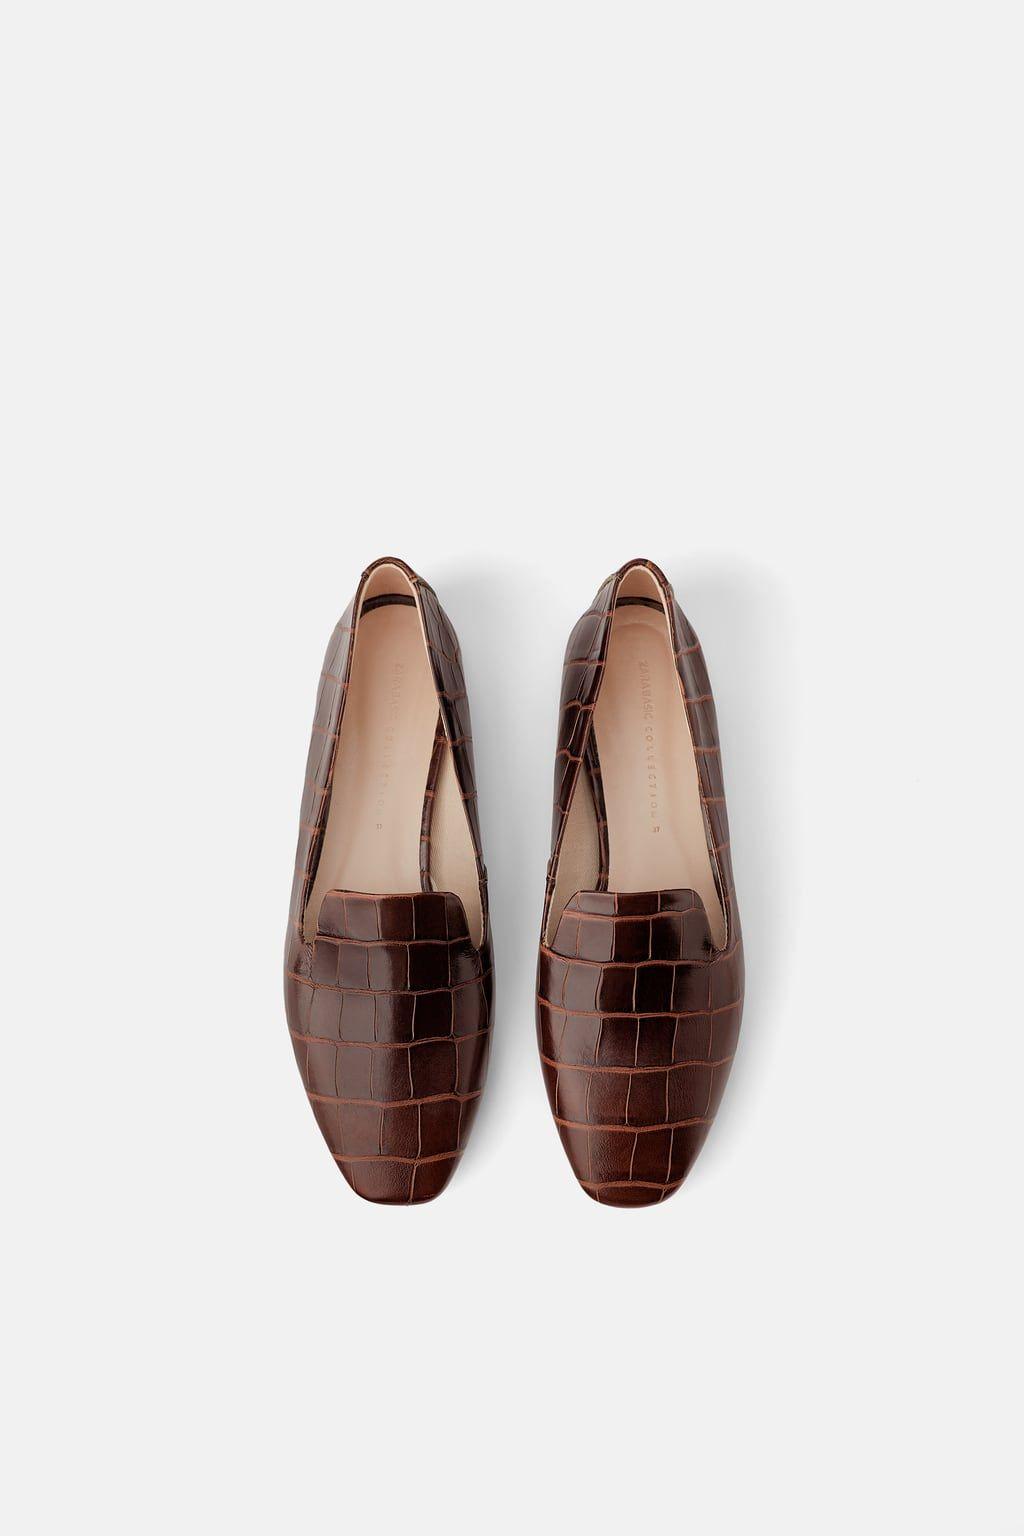 da734ede6ea Animal print leather flat shoes in 2019 | Style | Animal print flats ...